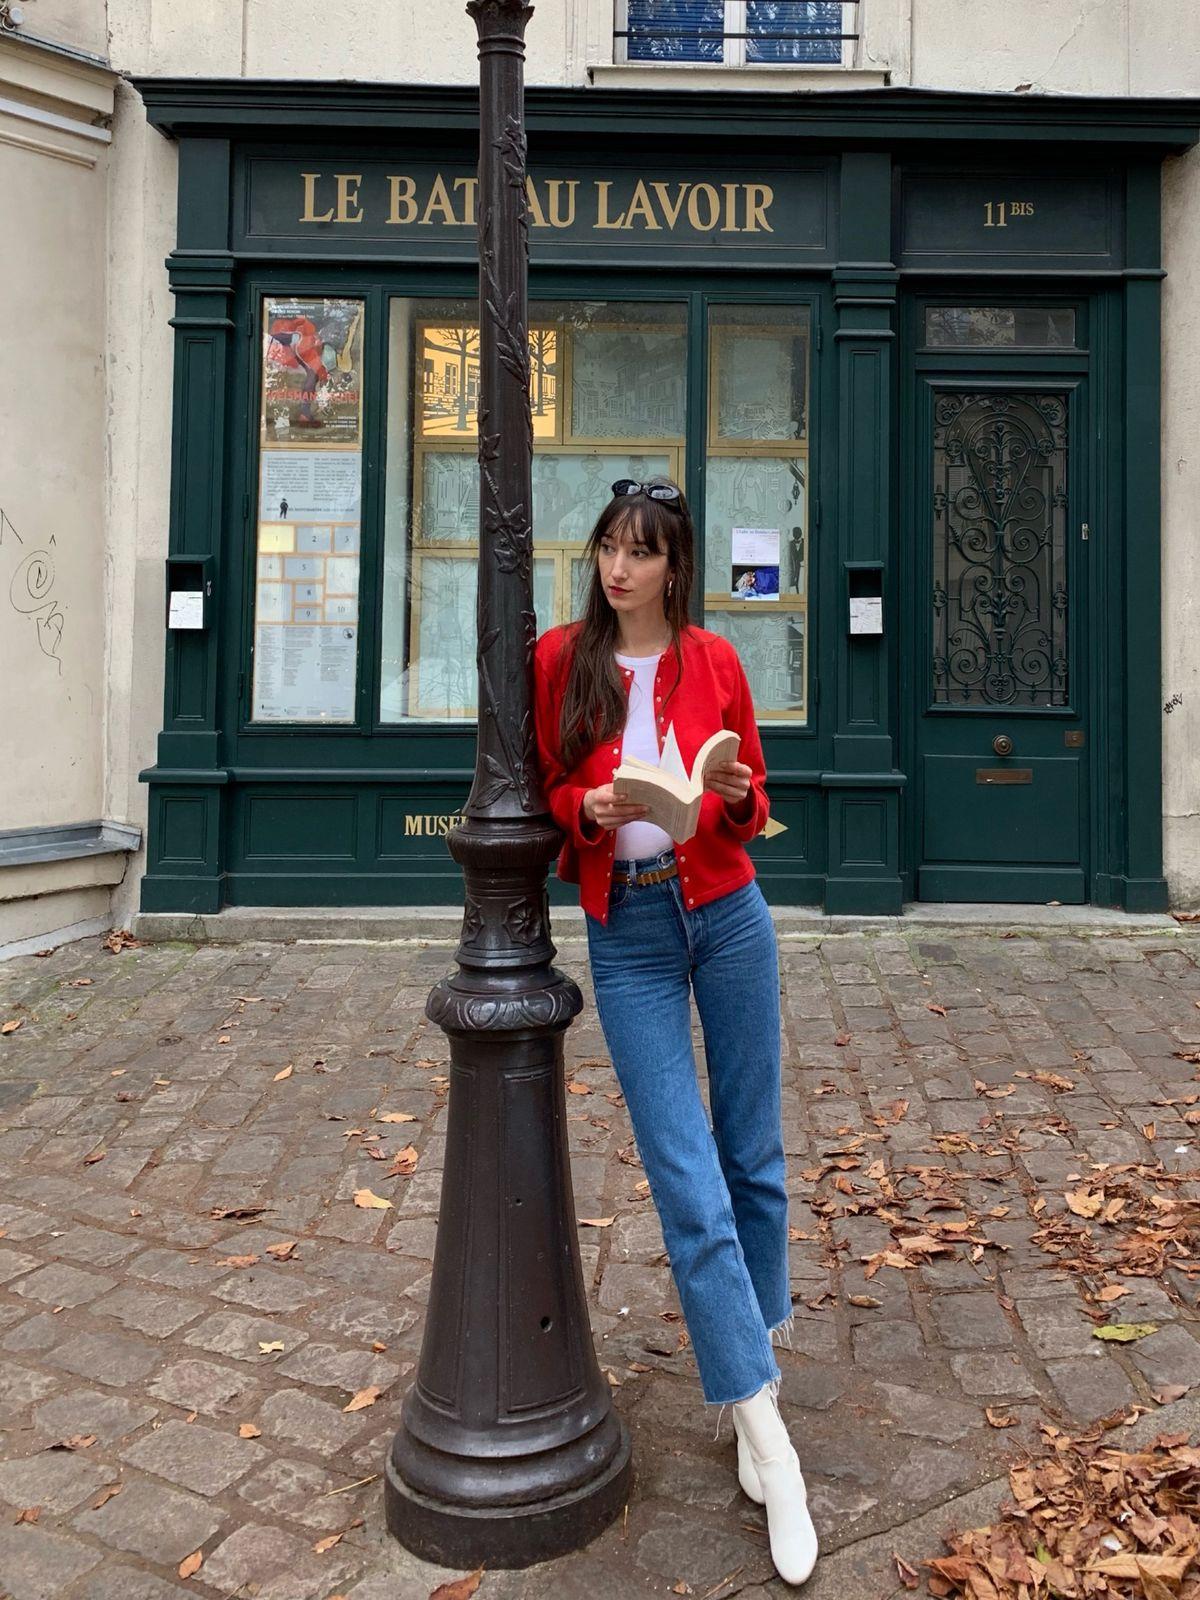 Agnes b Cardigan Pression, Paris, France